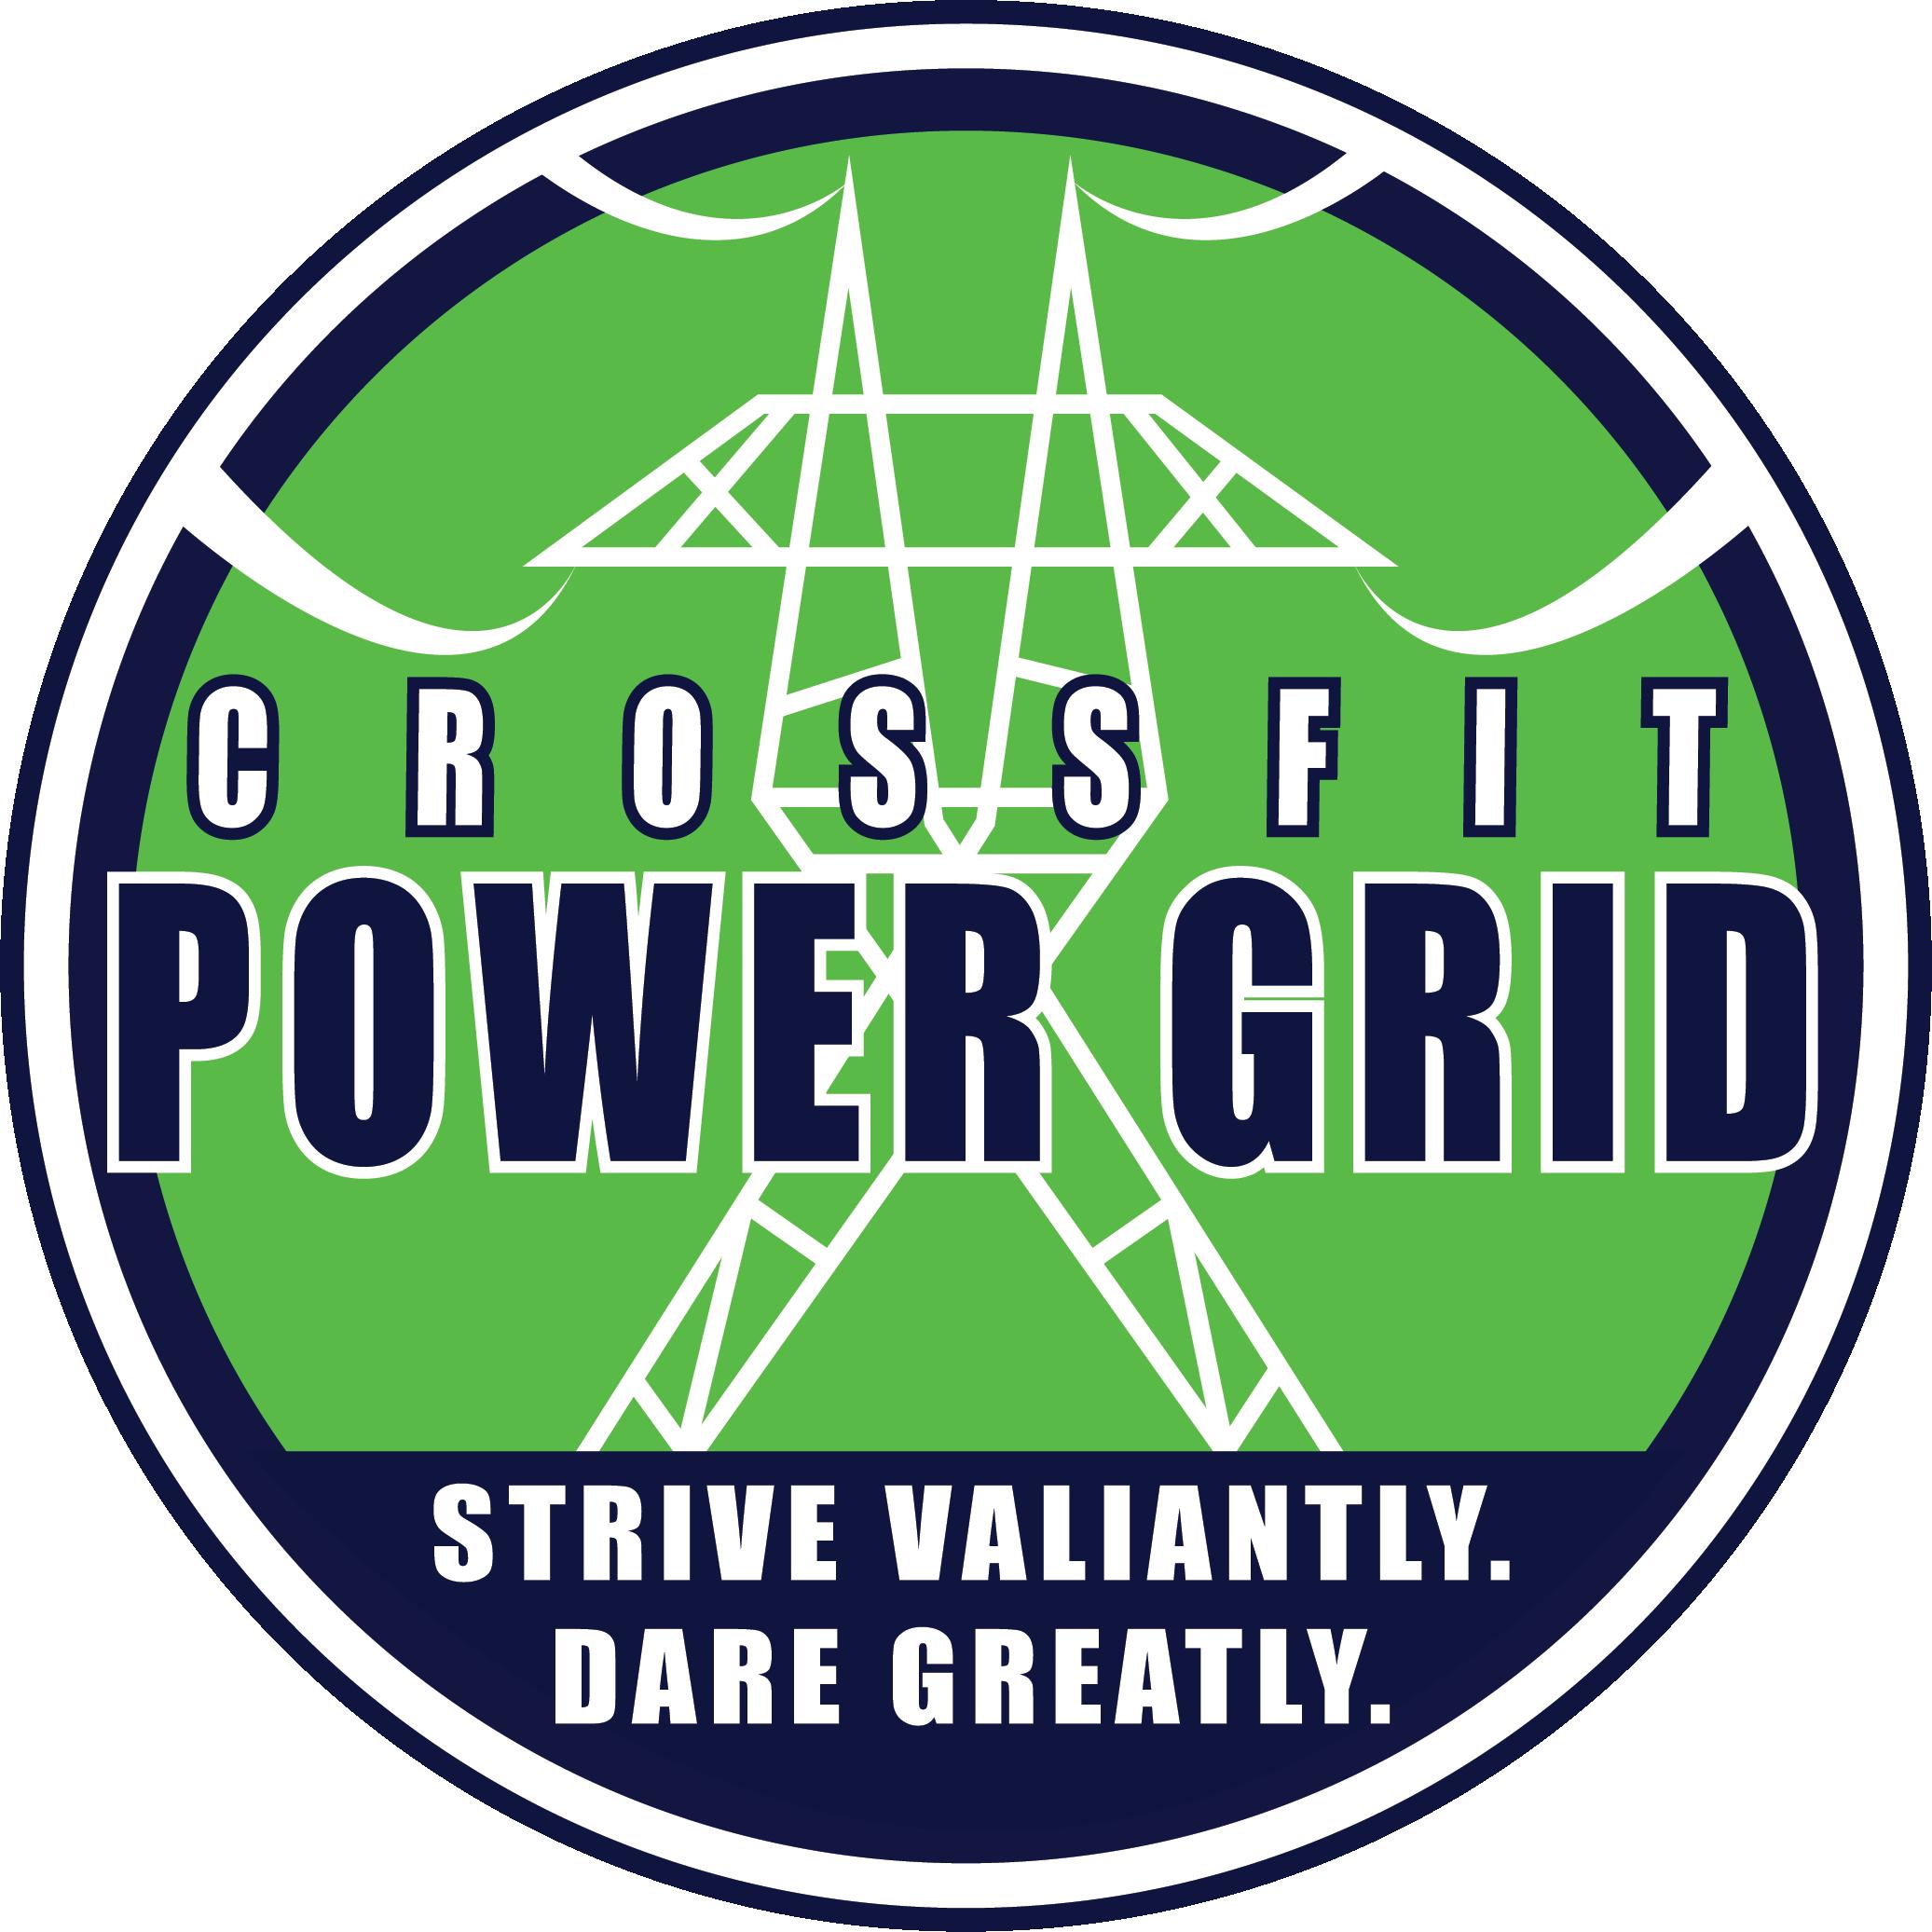 CrossFit Power Grid logo